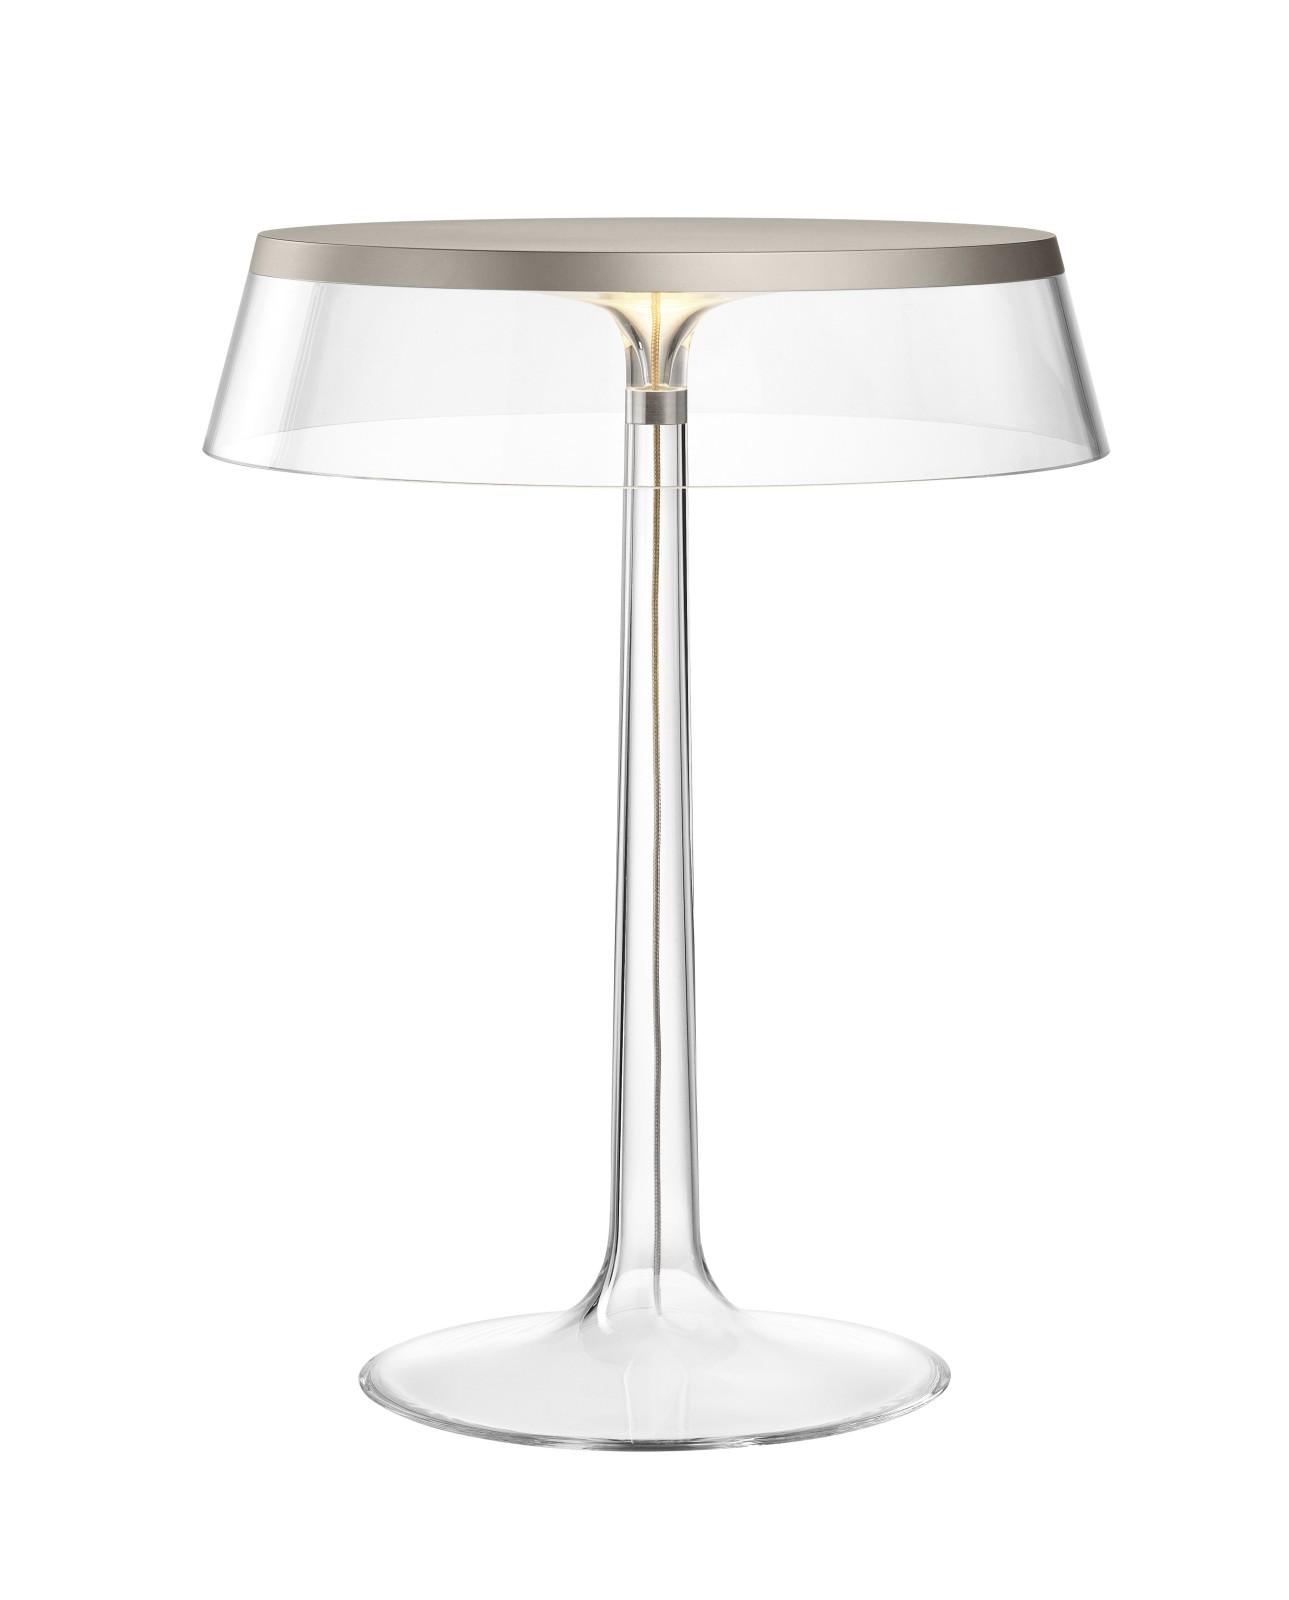 Bon Jour T Table Lamp Matt Chrome Top, Transparent Shade